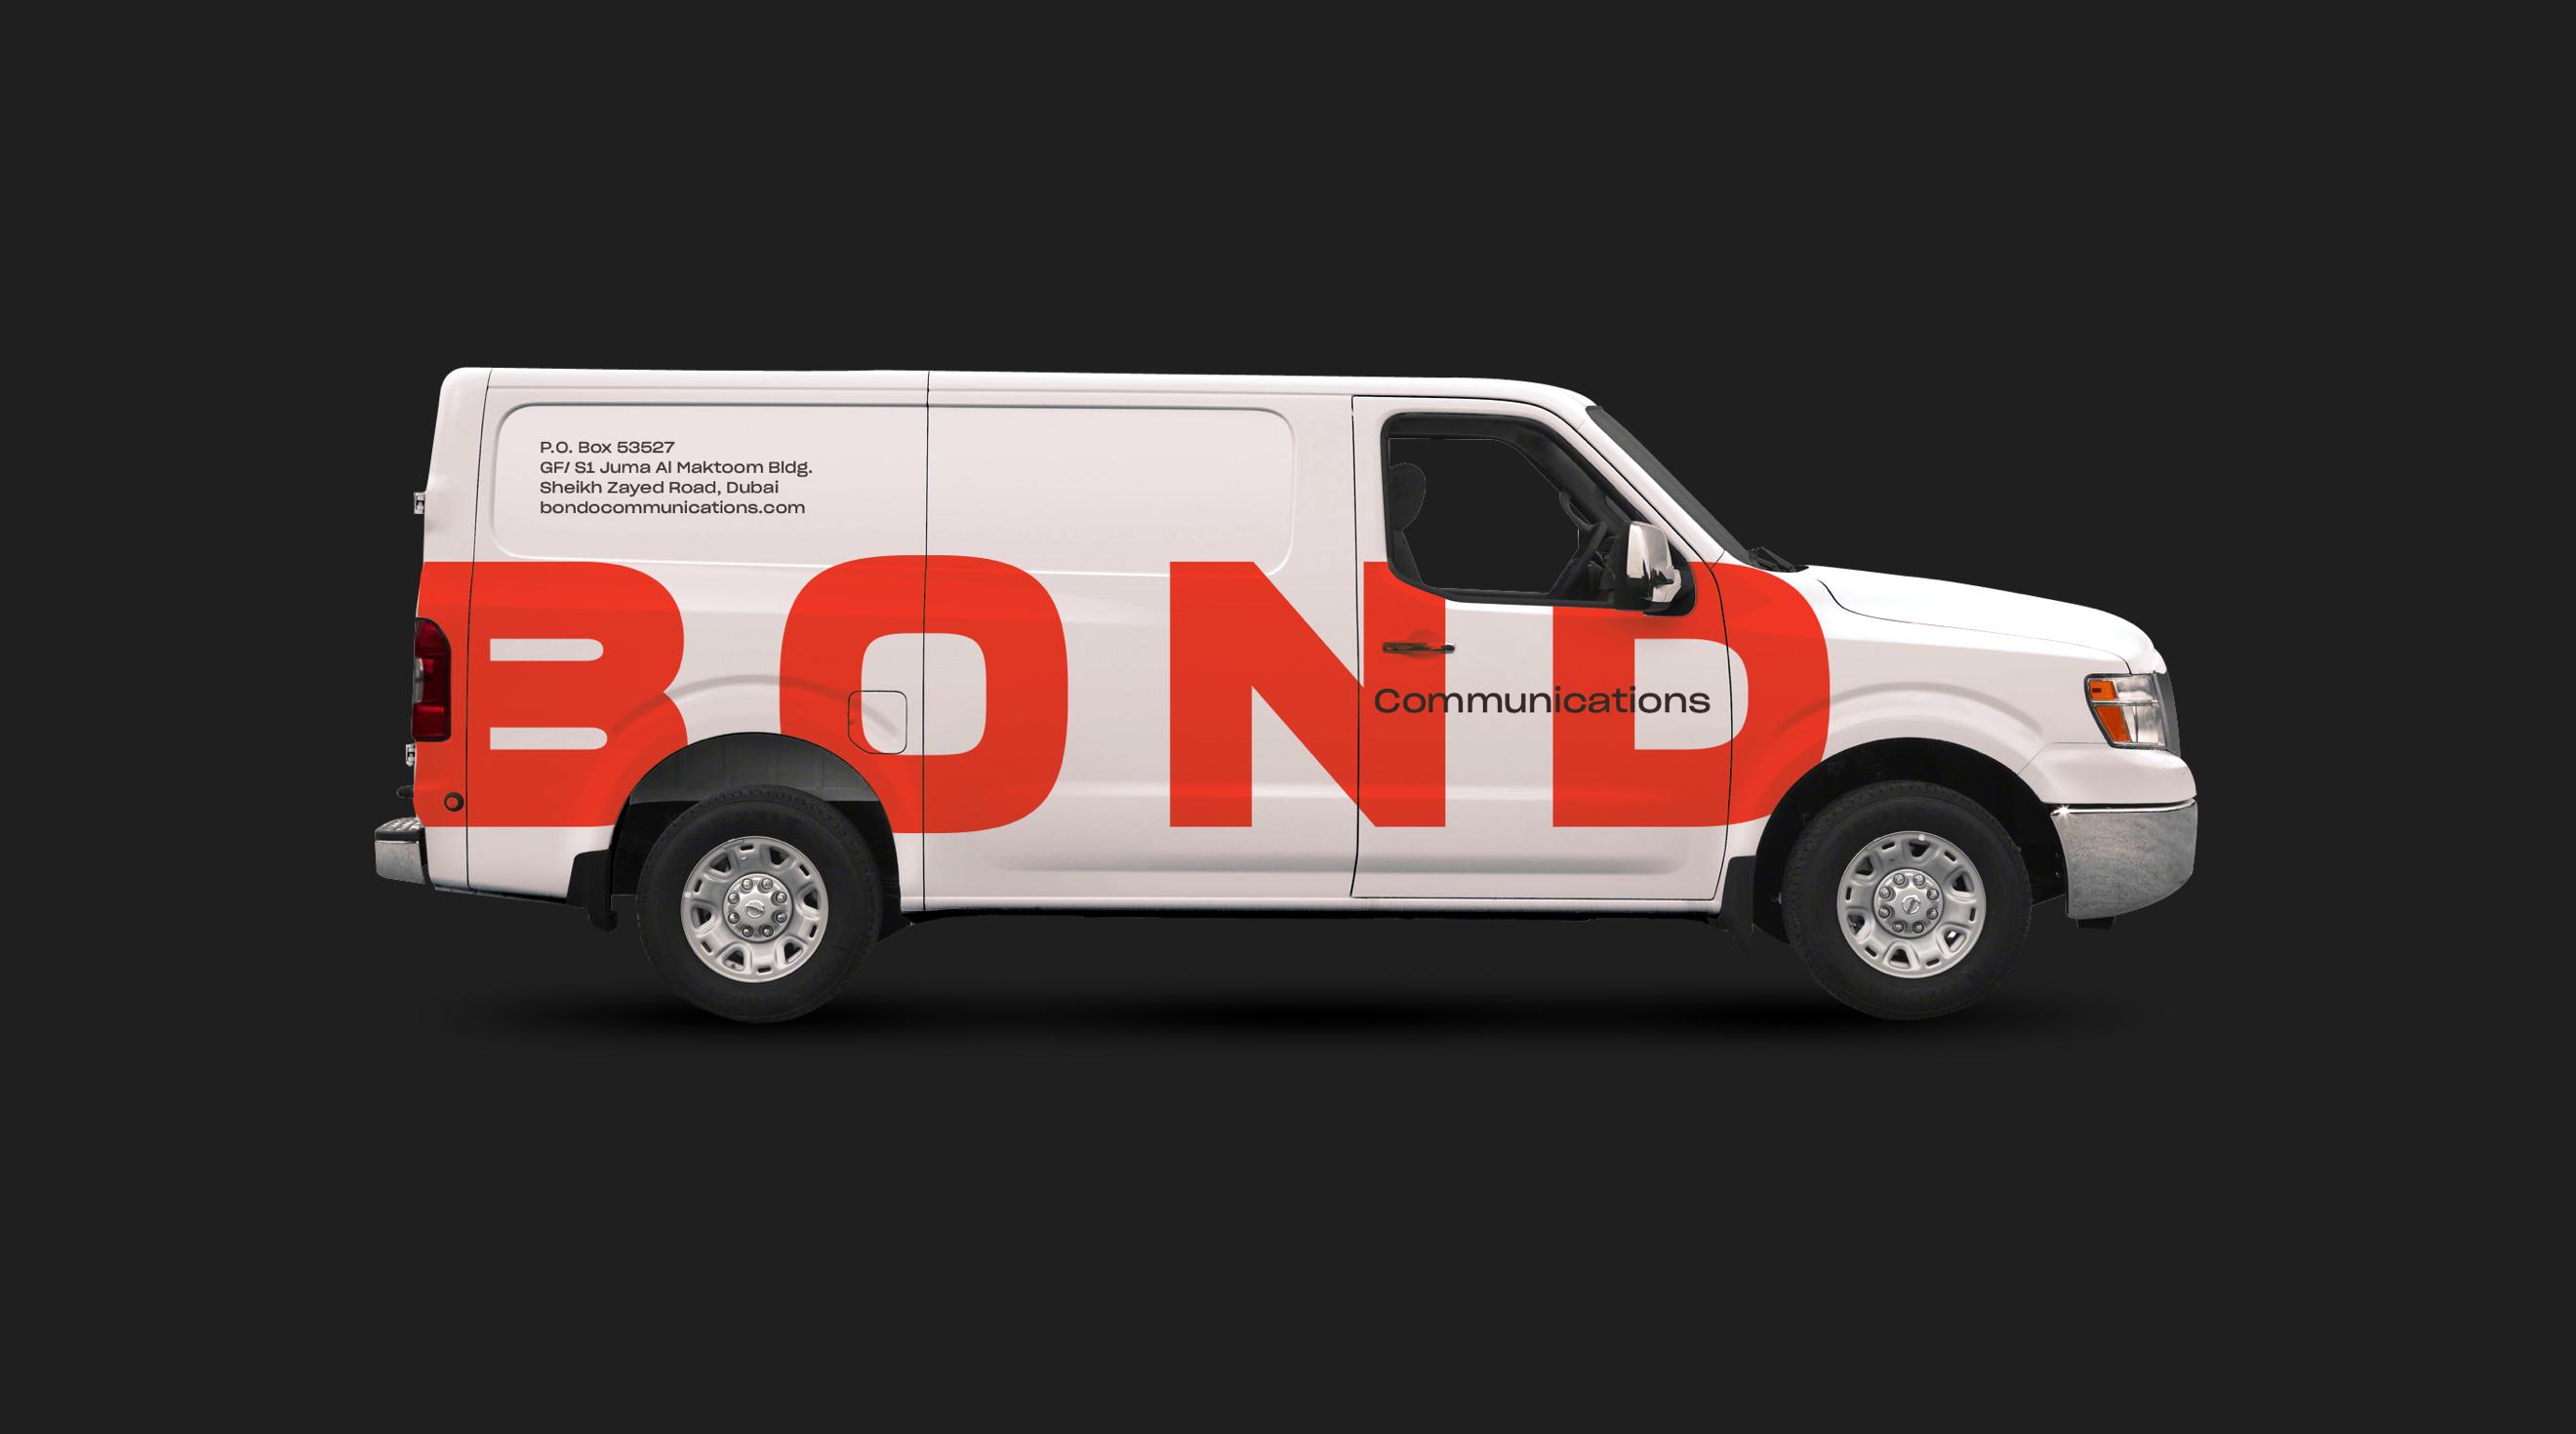 Bond Communications